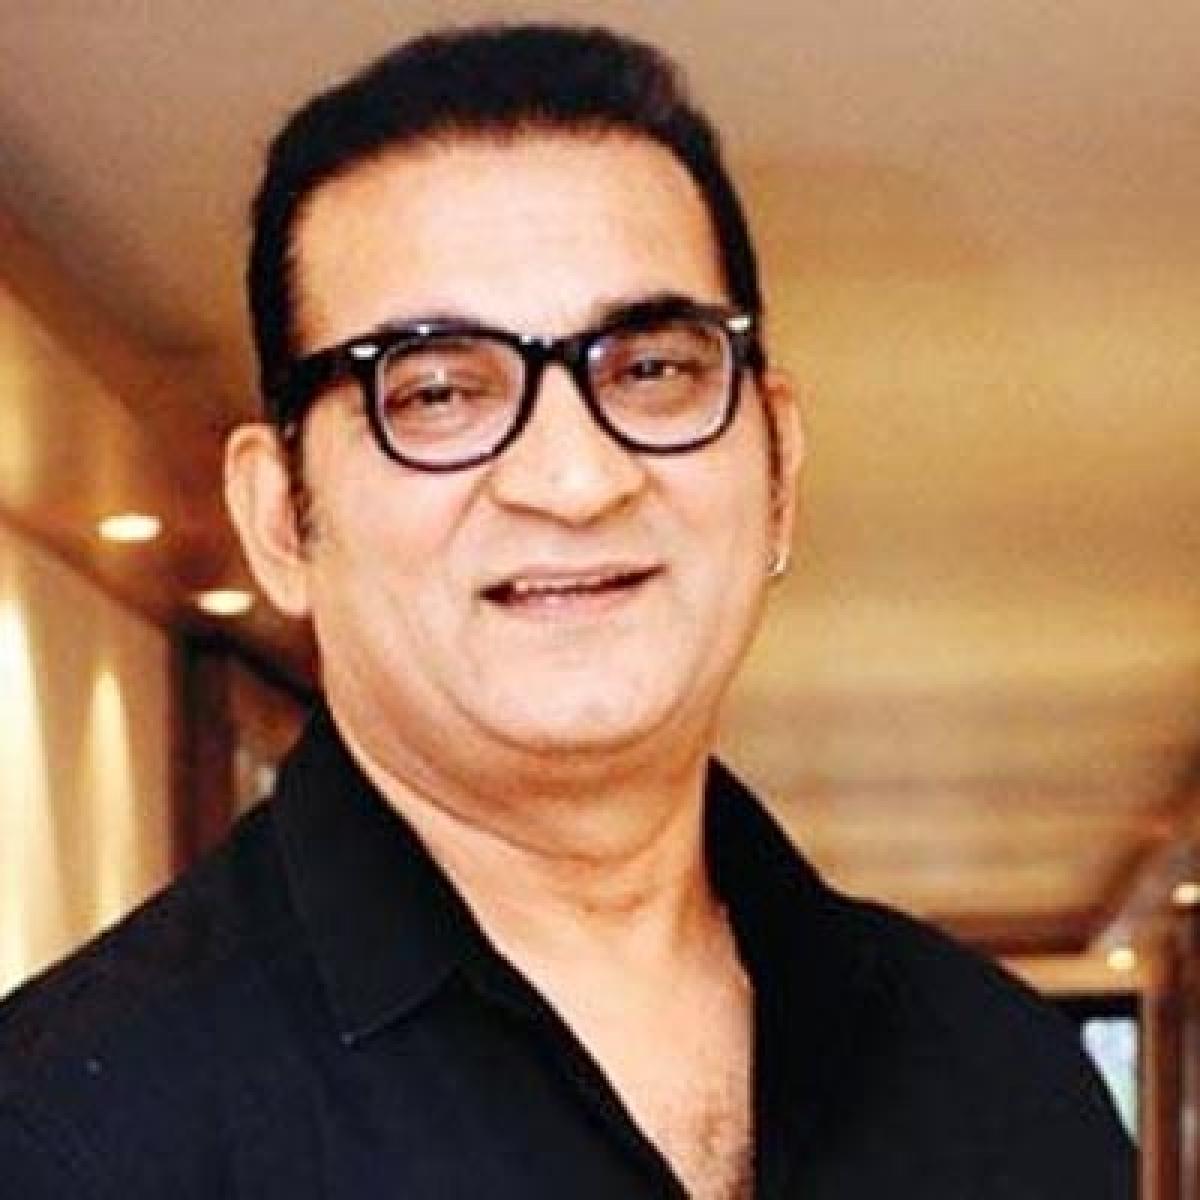 Mumbai AAP leader Preeti Sharma registers case against singer Abhijeet